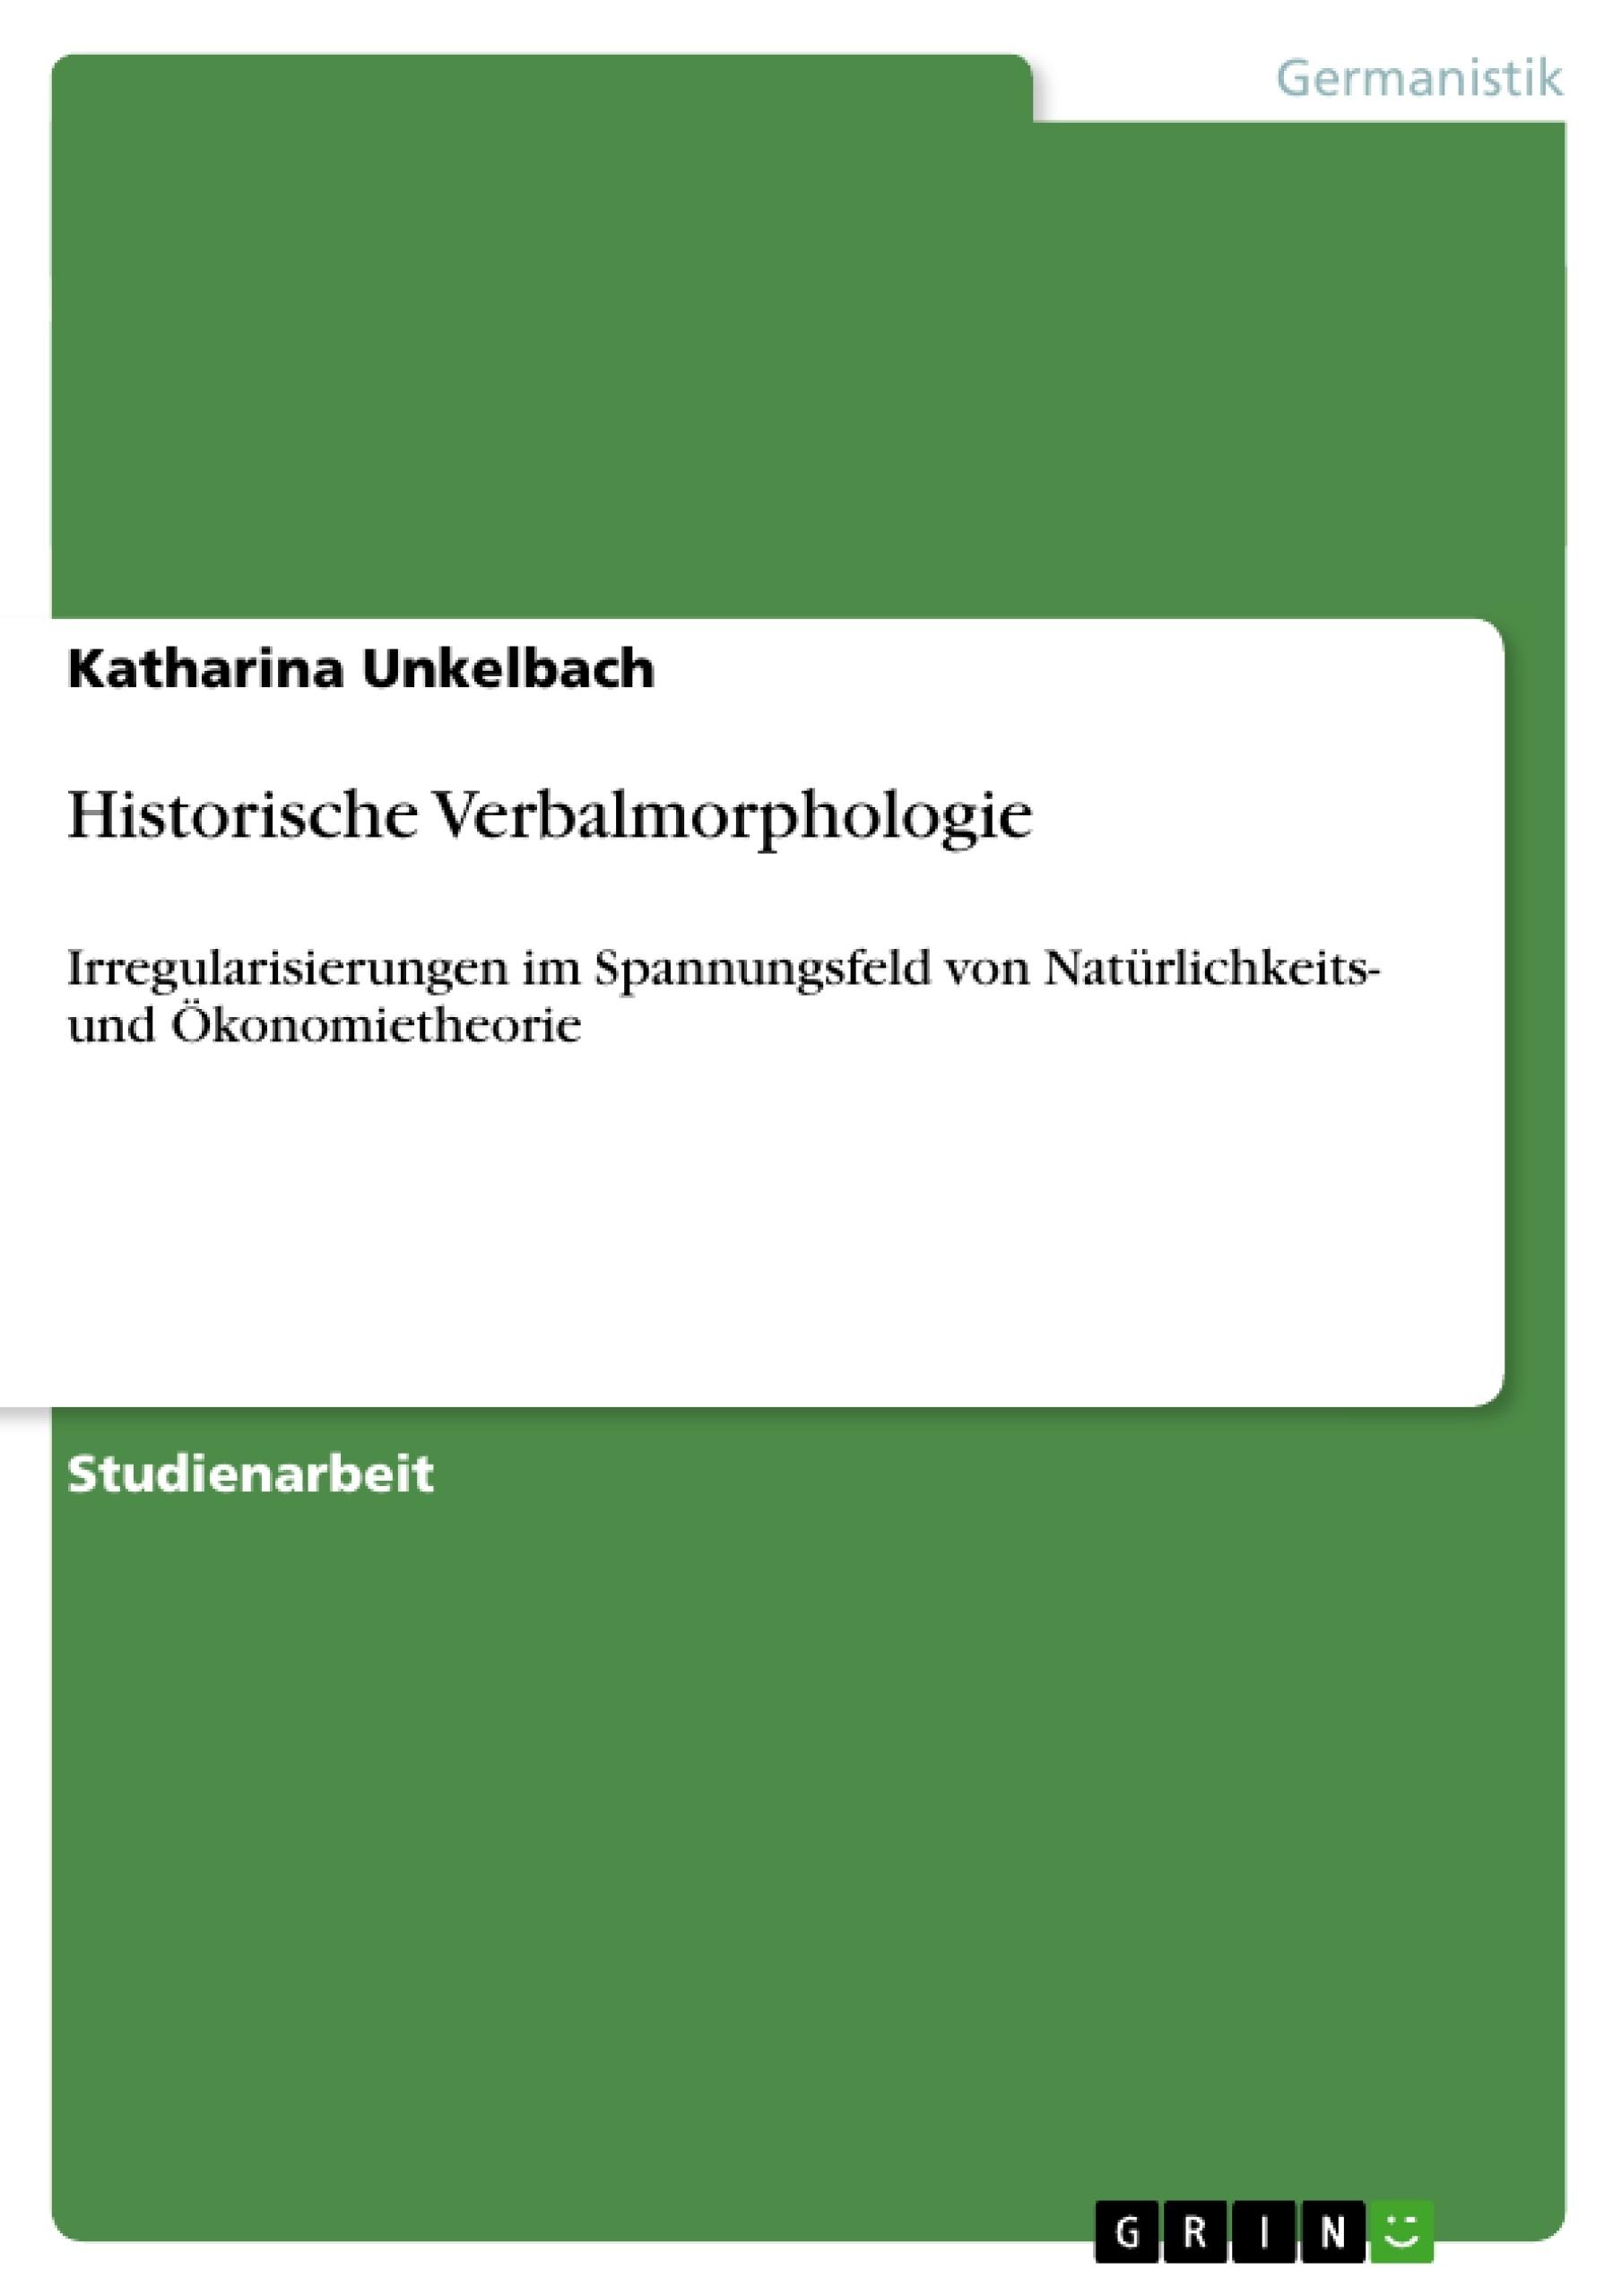 Titel: Historische Verbalmorphologie